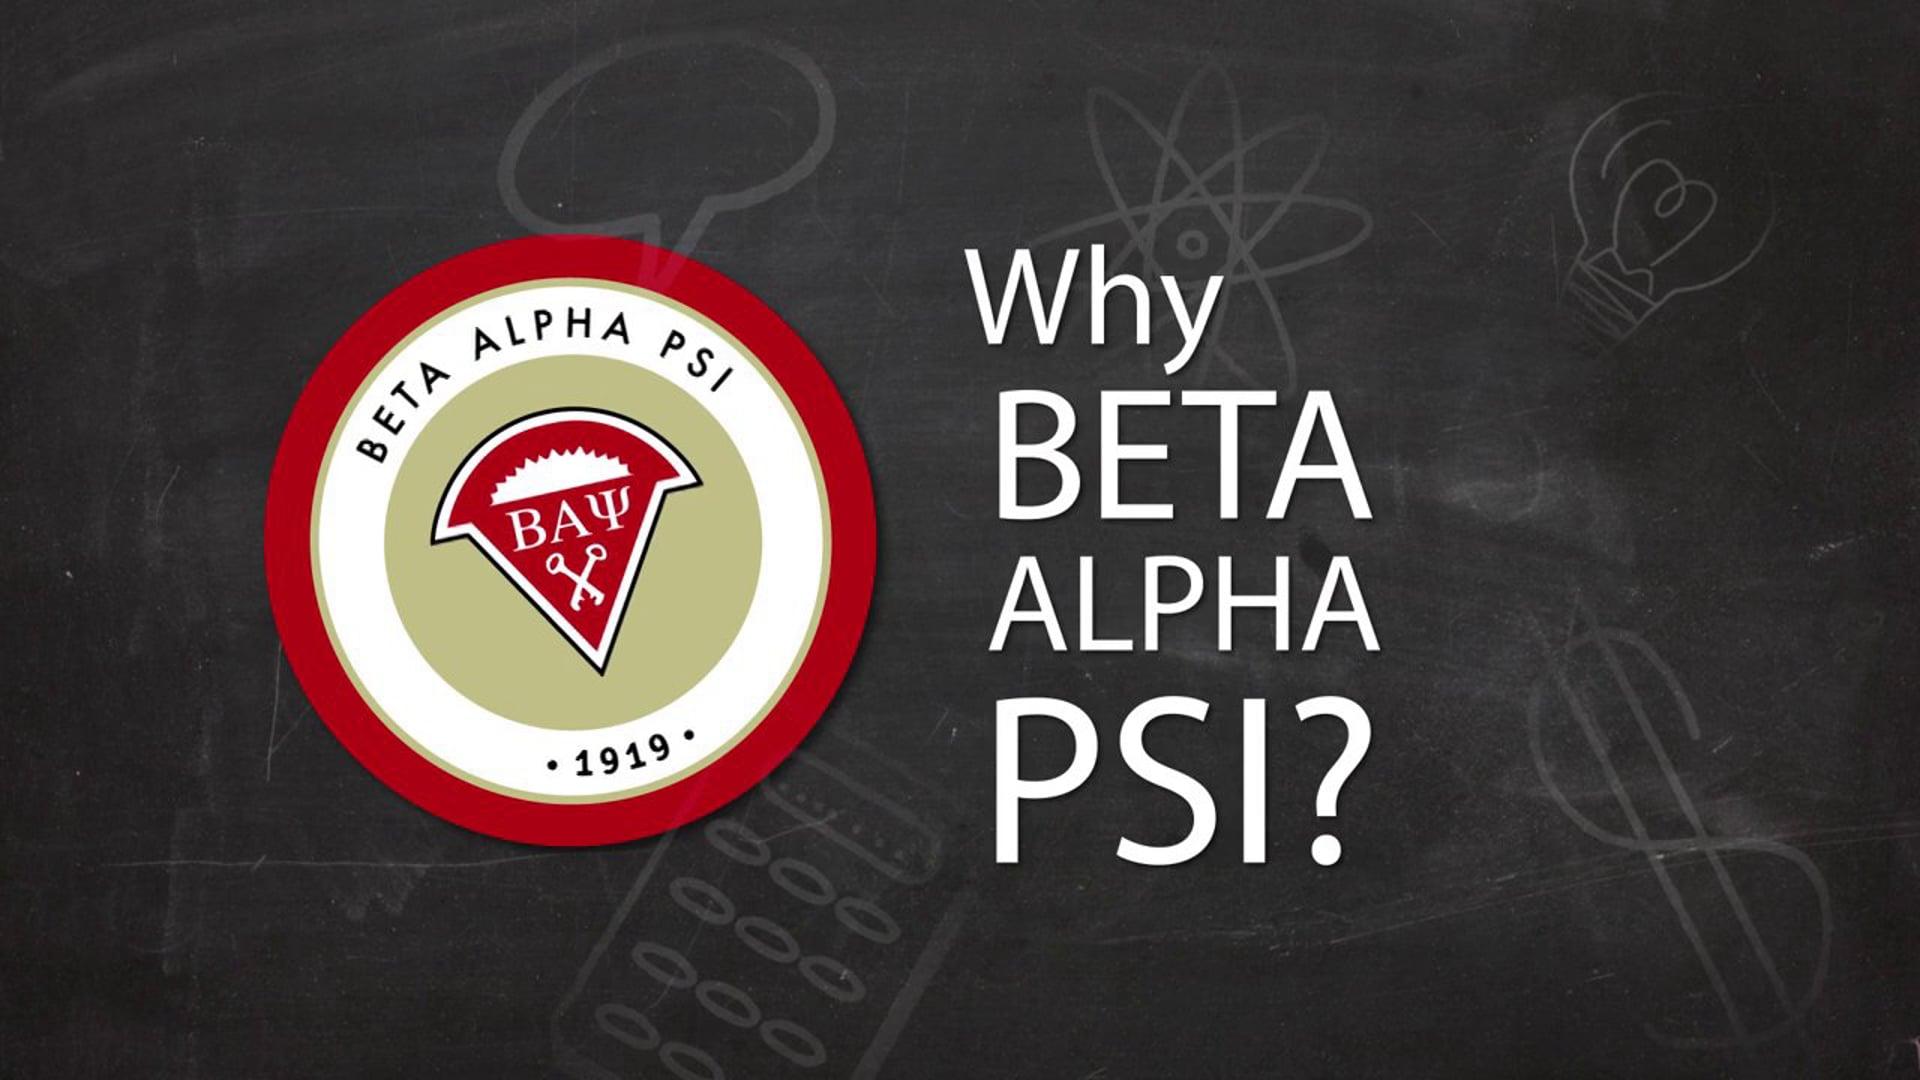 Why Beta Alpha Psi?